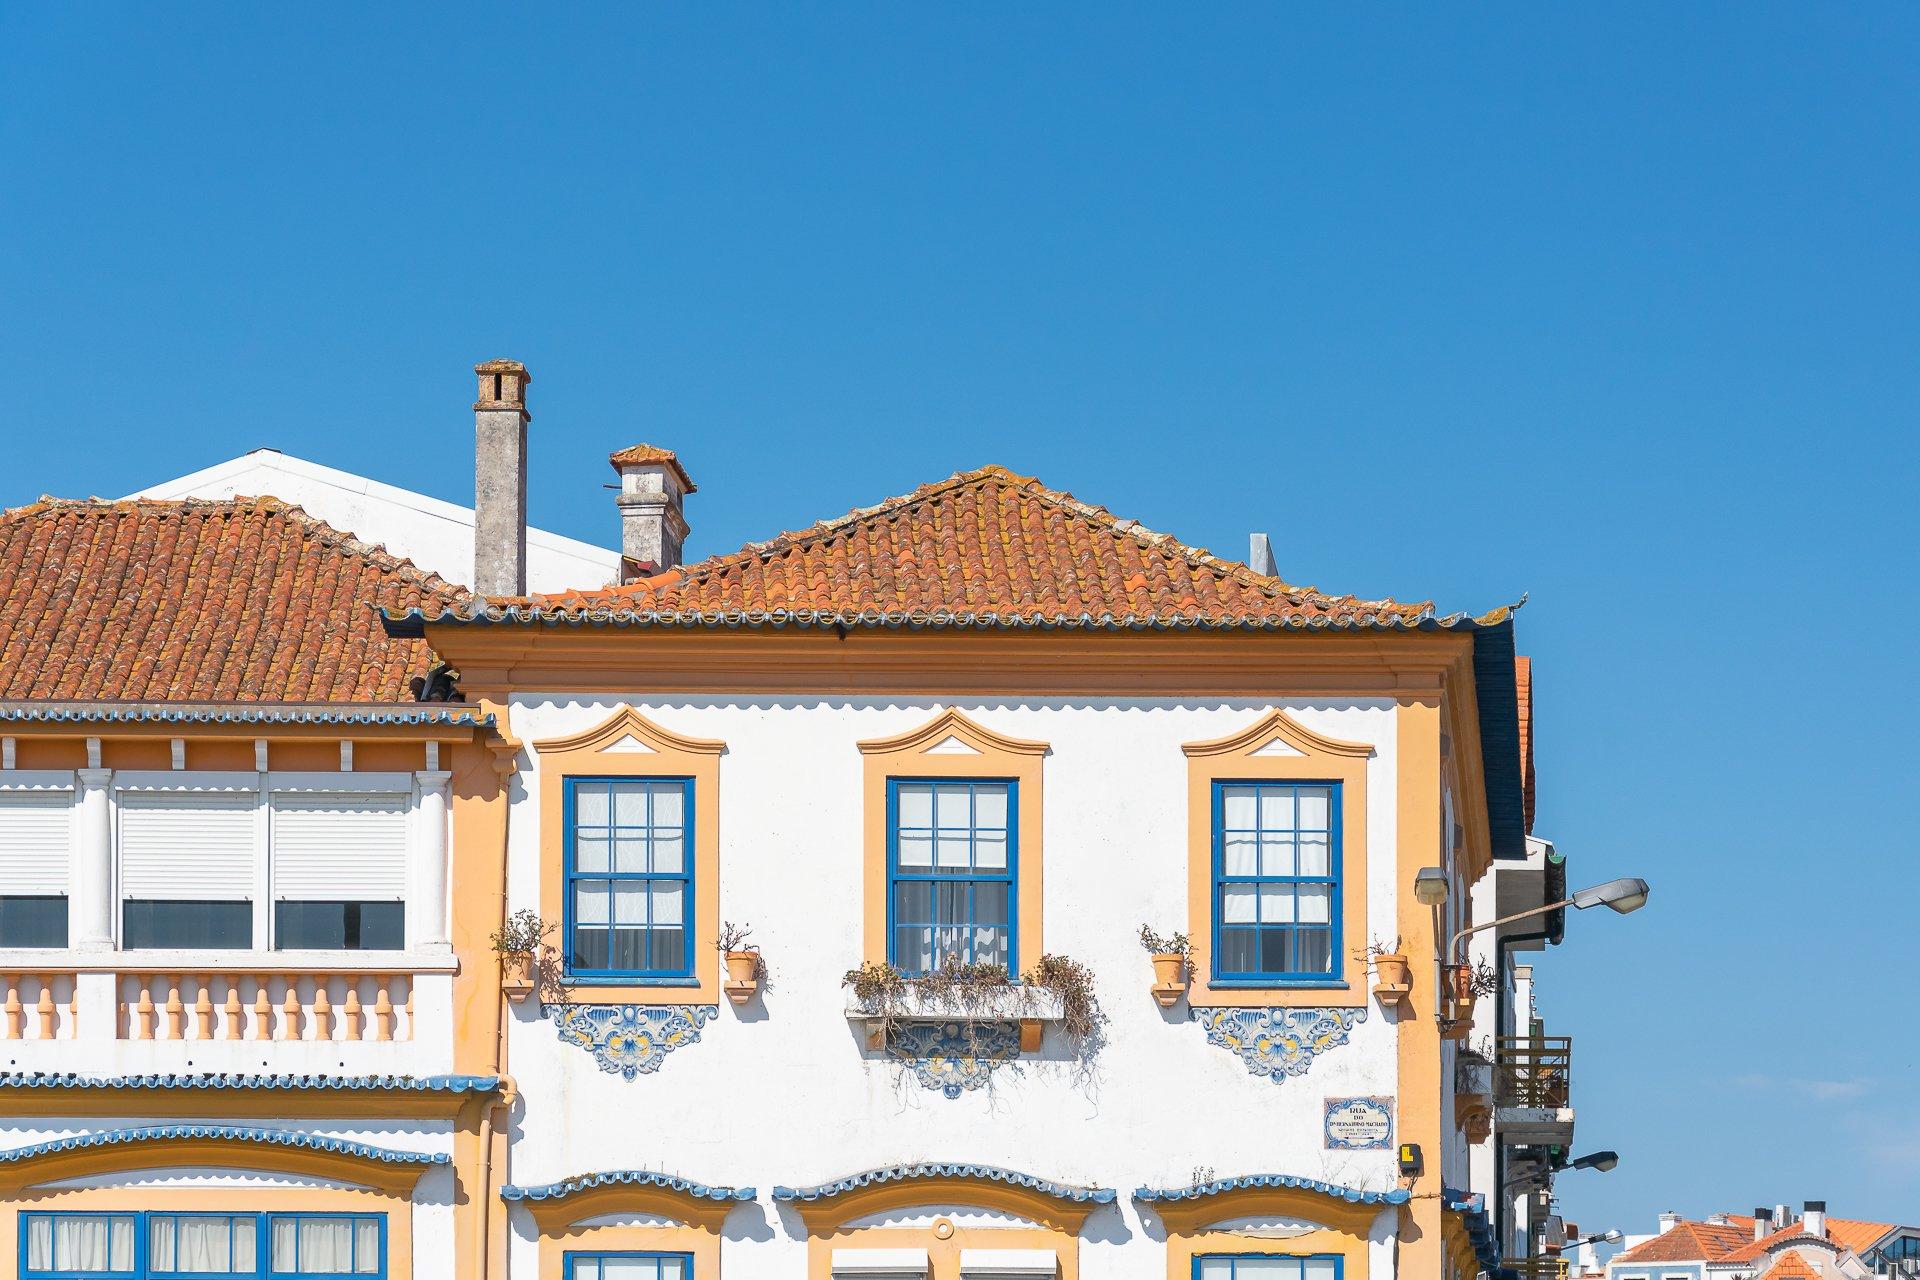 dumundo_visit_aveiro_portugal_0